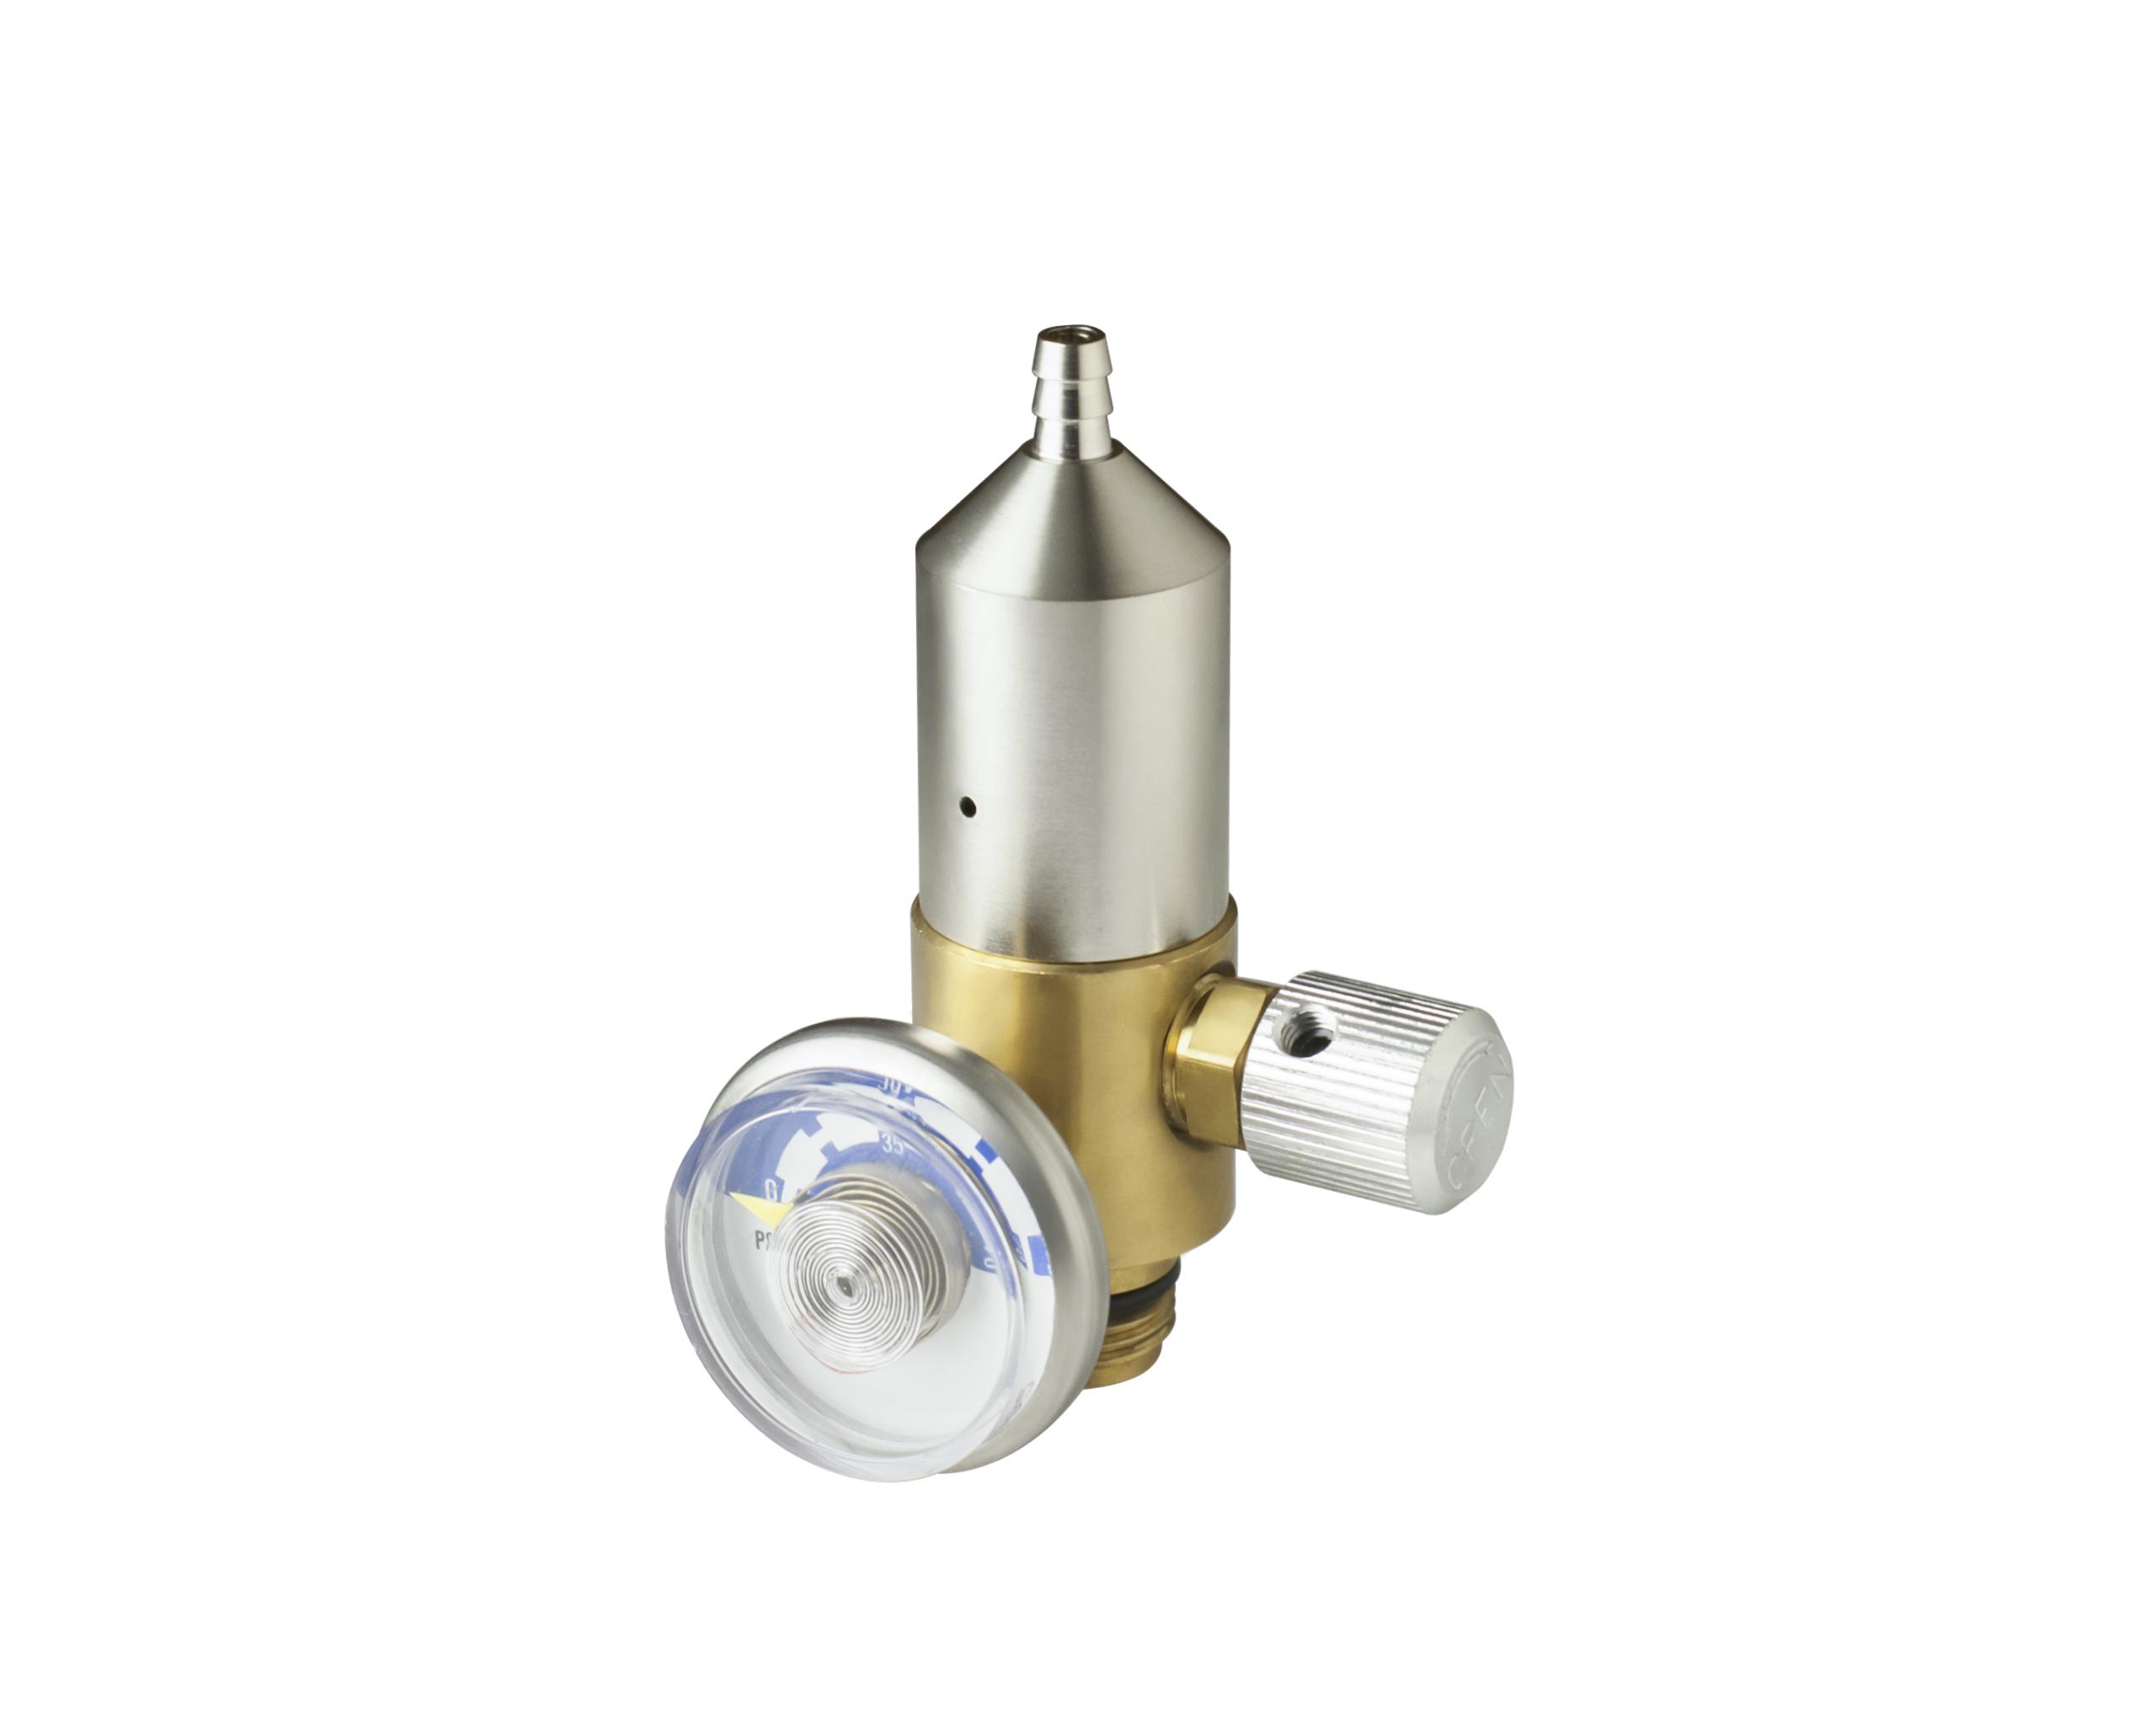 0.30 LPM Fixed Flow Various Flow Rates Between 0.1-2.5 LPM Premier Industries OEM Calibration Gas Regulator C10 Inlet